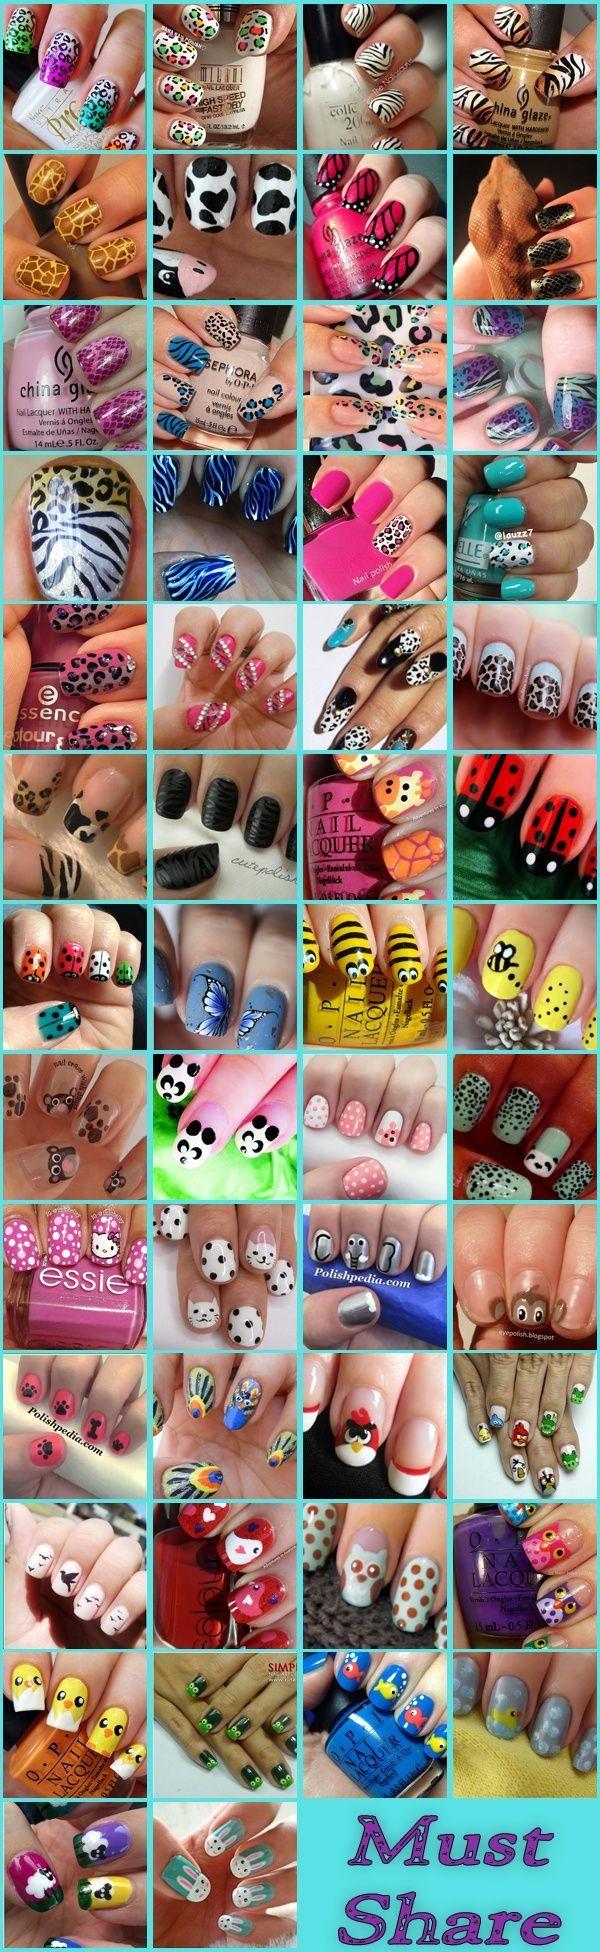 Nail Art Designs For Beginners: Go easy on yourself and start with these easy nail art designs for beginners.